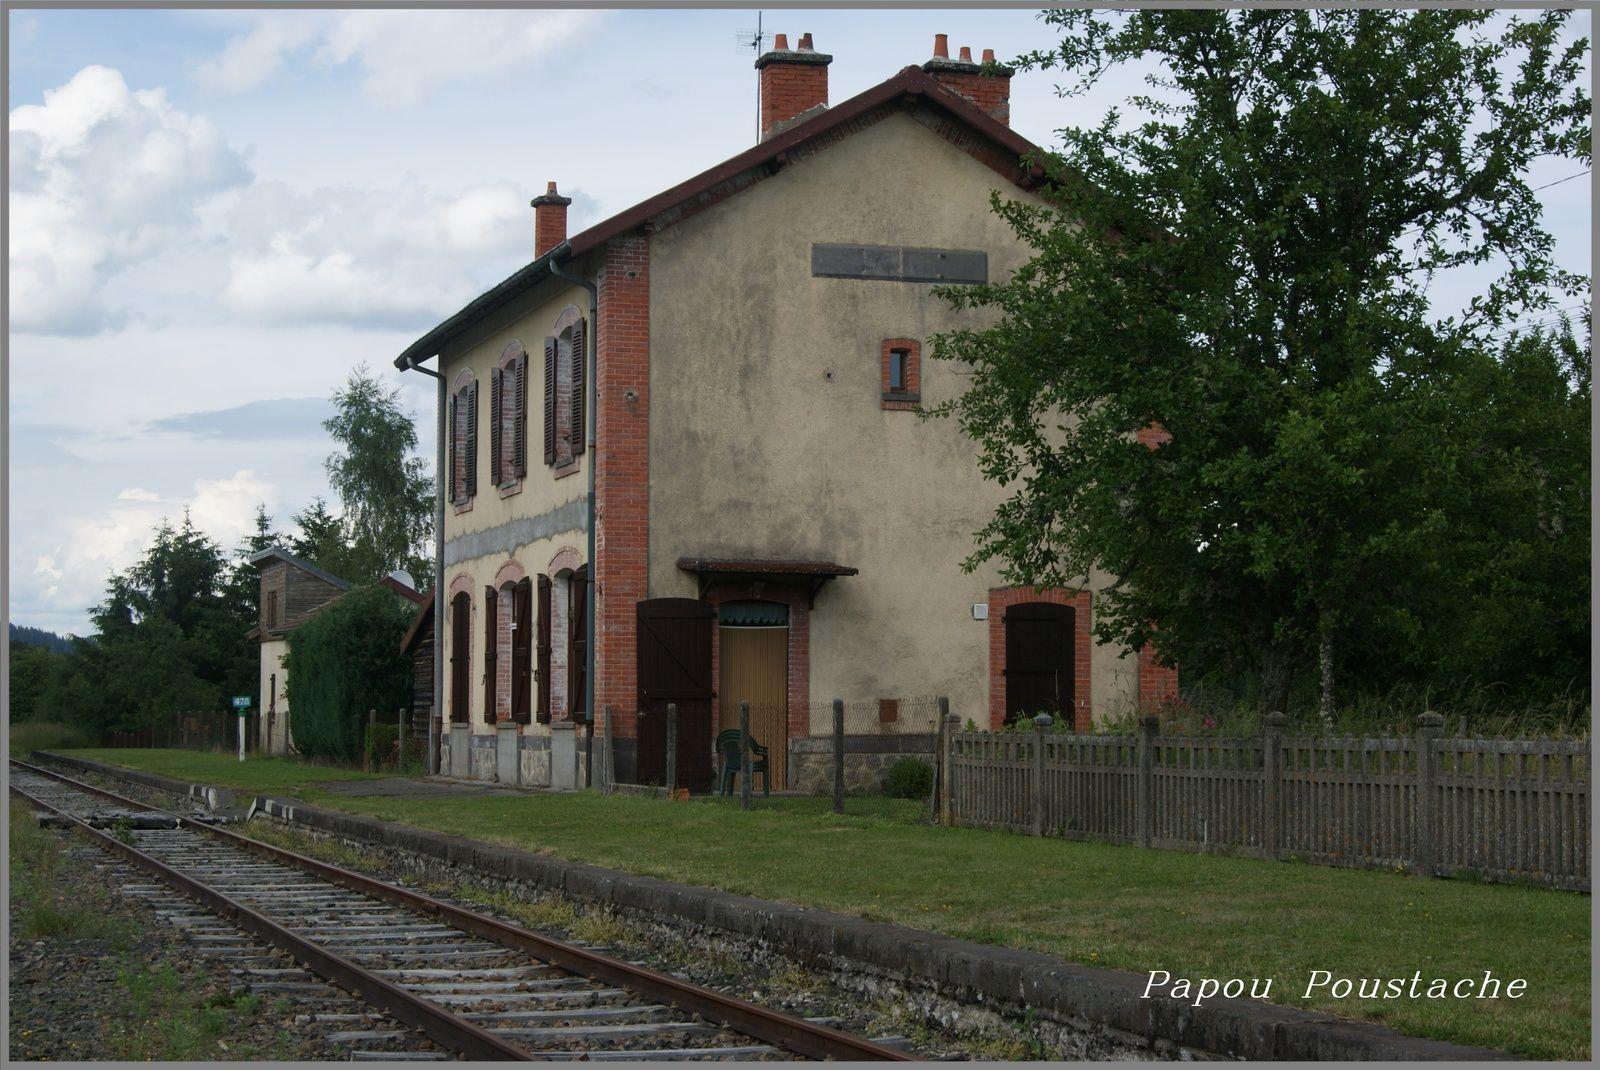 La gare de Saint Alyre d'Arlanc